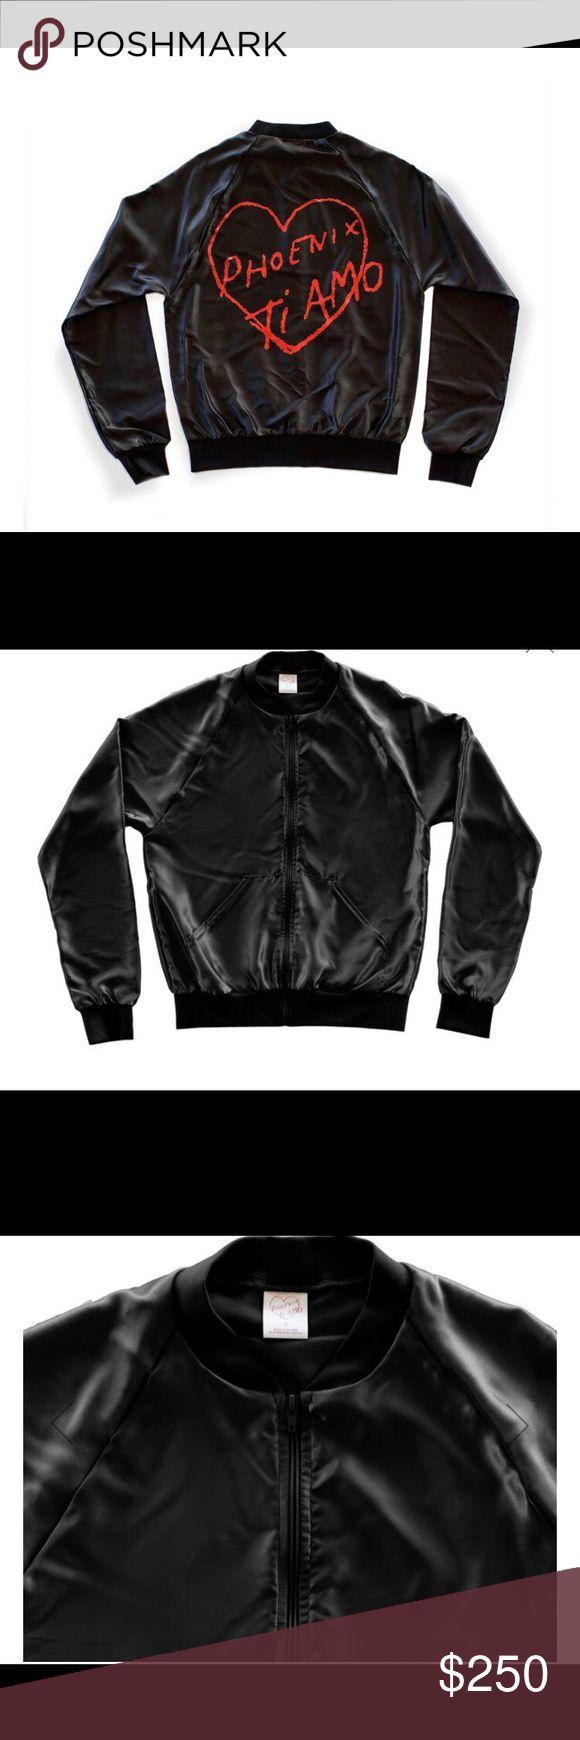 Cool Phoenix Band - Ti Amo Satin Jacket, Black [Limited Edition] Coolest band's new album Satin Black Jacket with Thomas Mars handwritten Ti Amo at the back Jackets & Coats